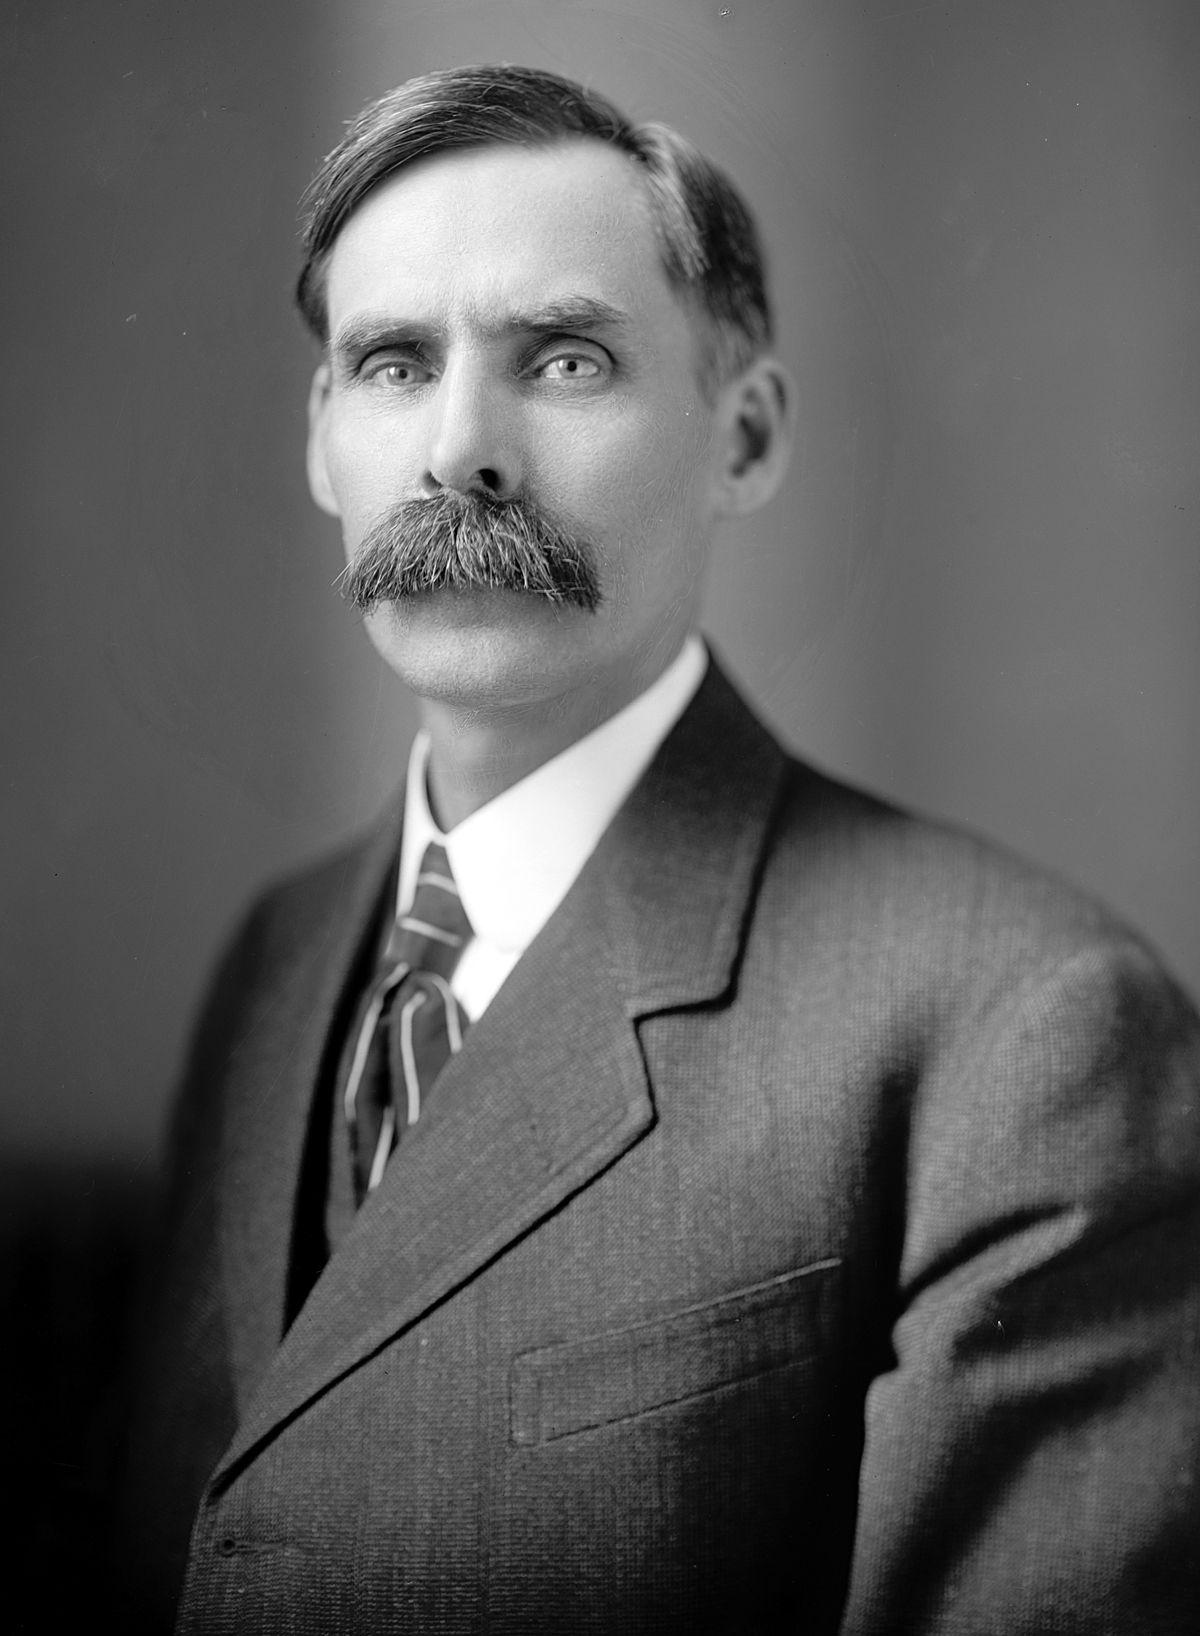 Andrew Volstead Wikipedia